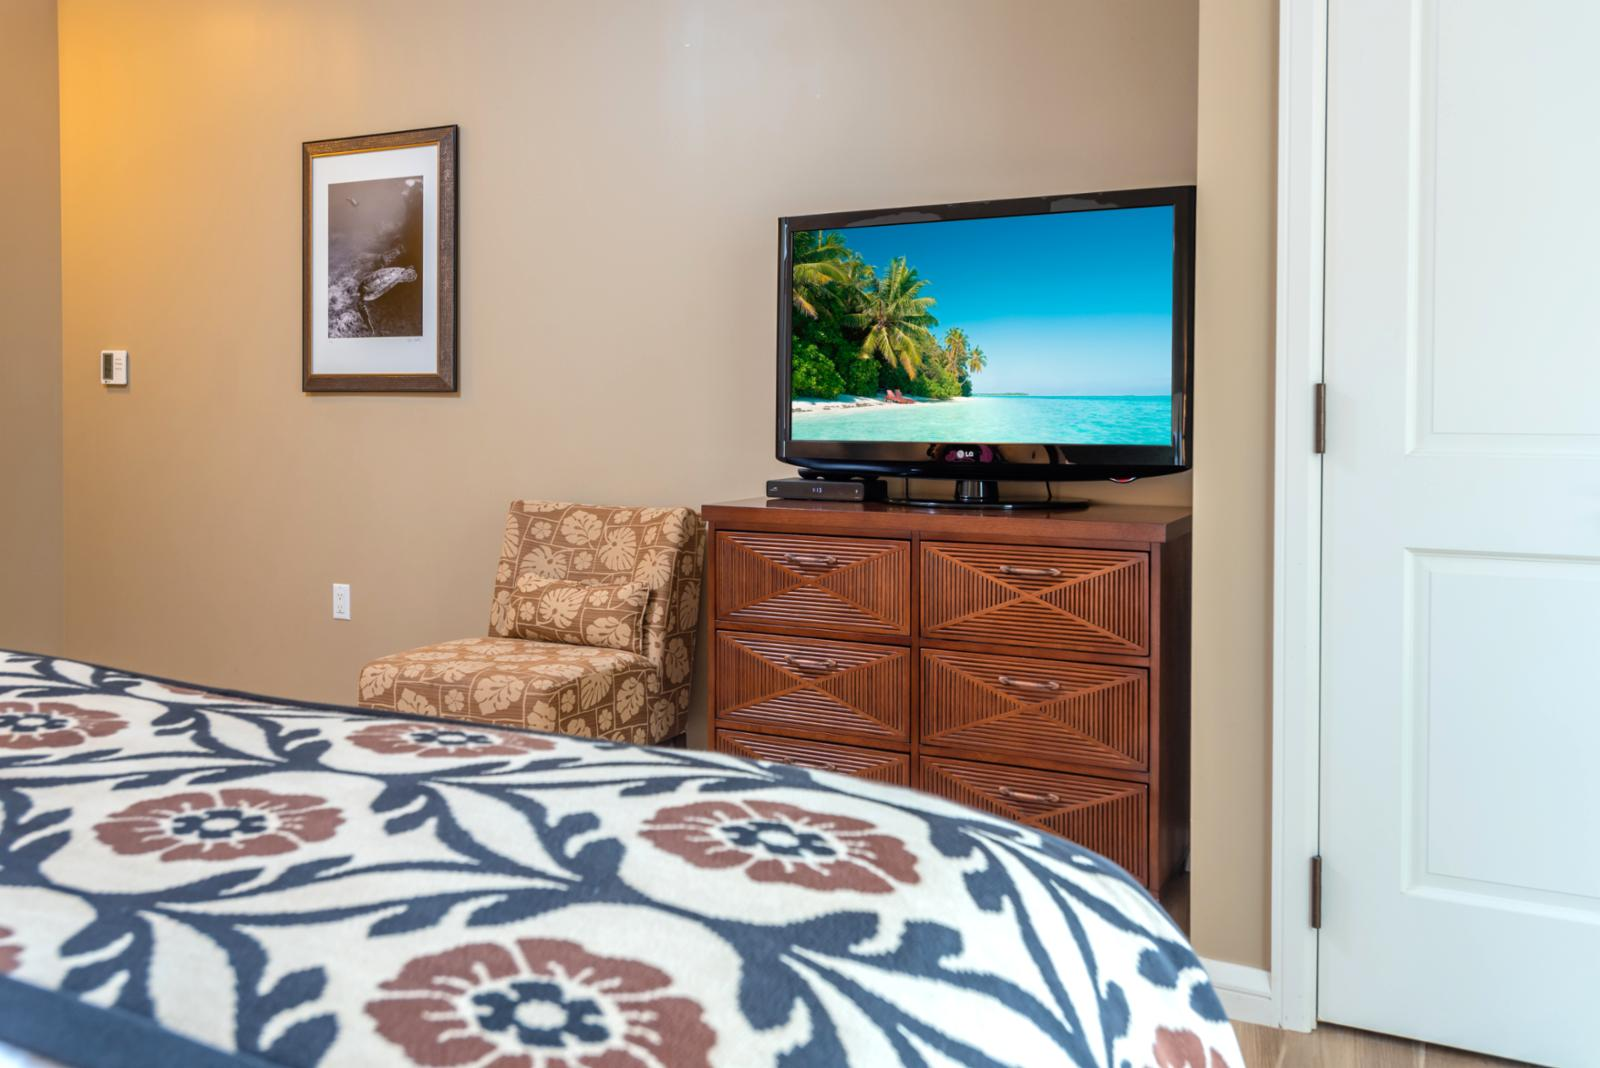 LARGE flatscreen television